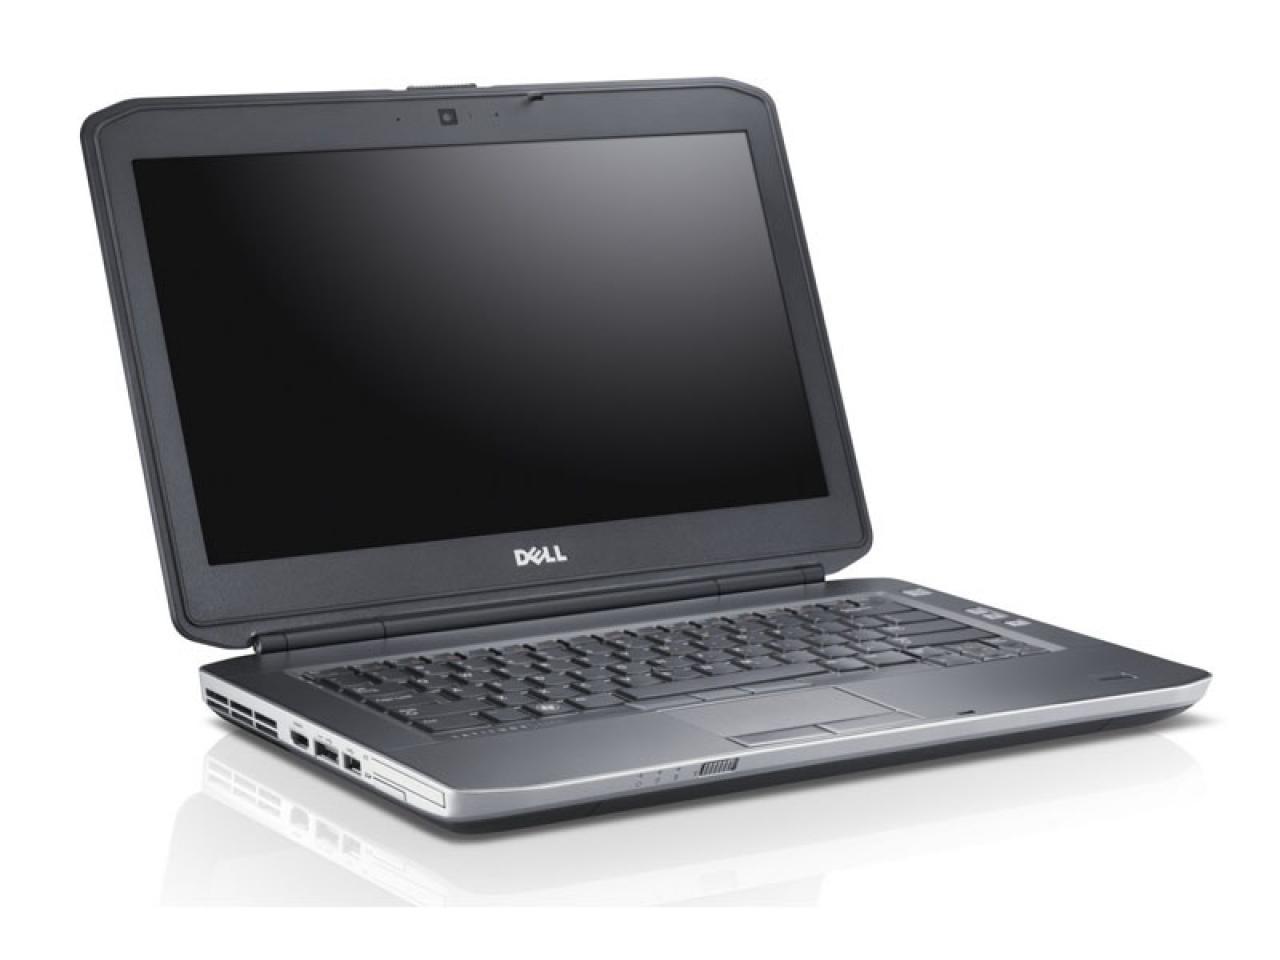 Dell Latitude E5430  - shop.bb-net.de